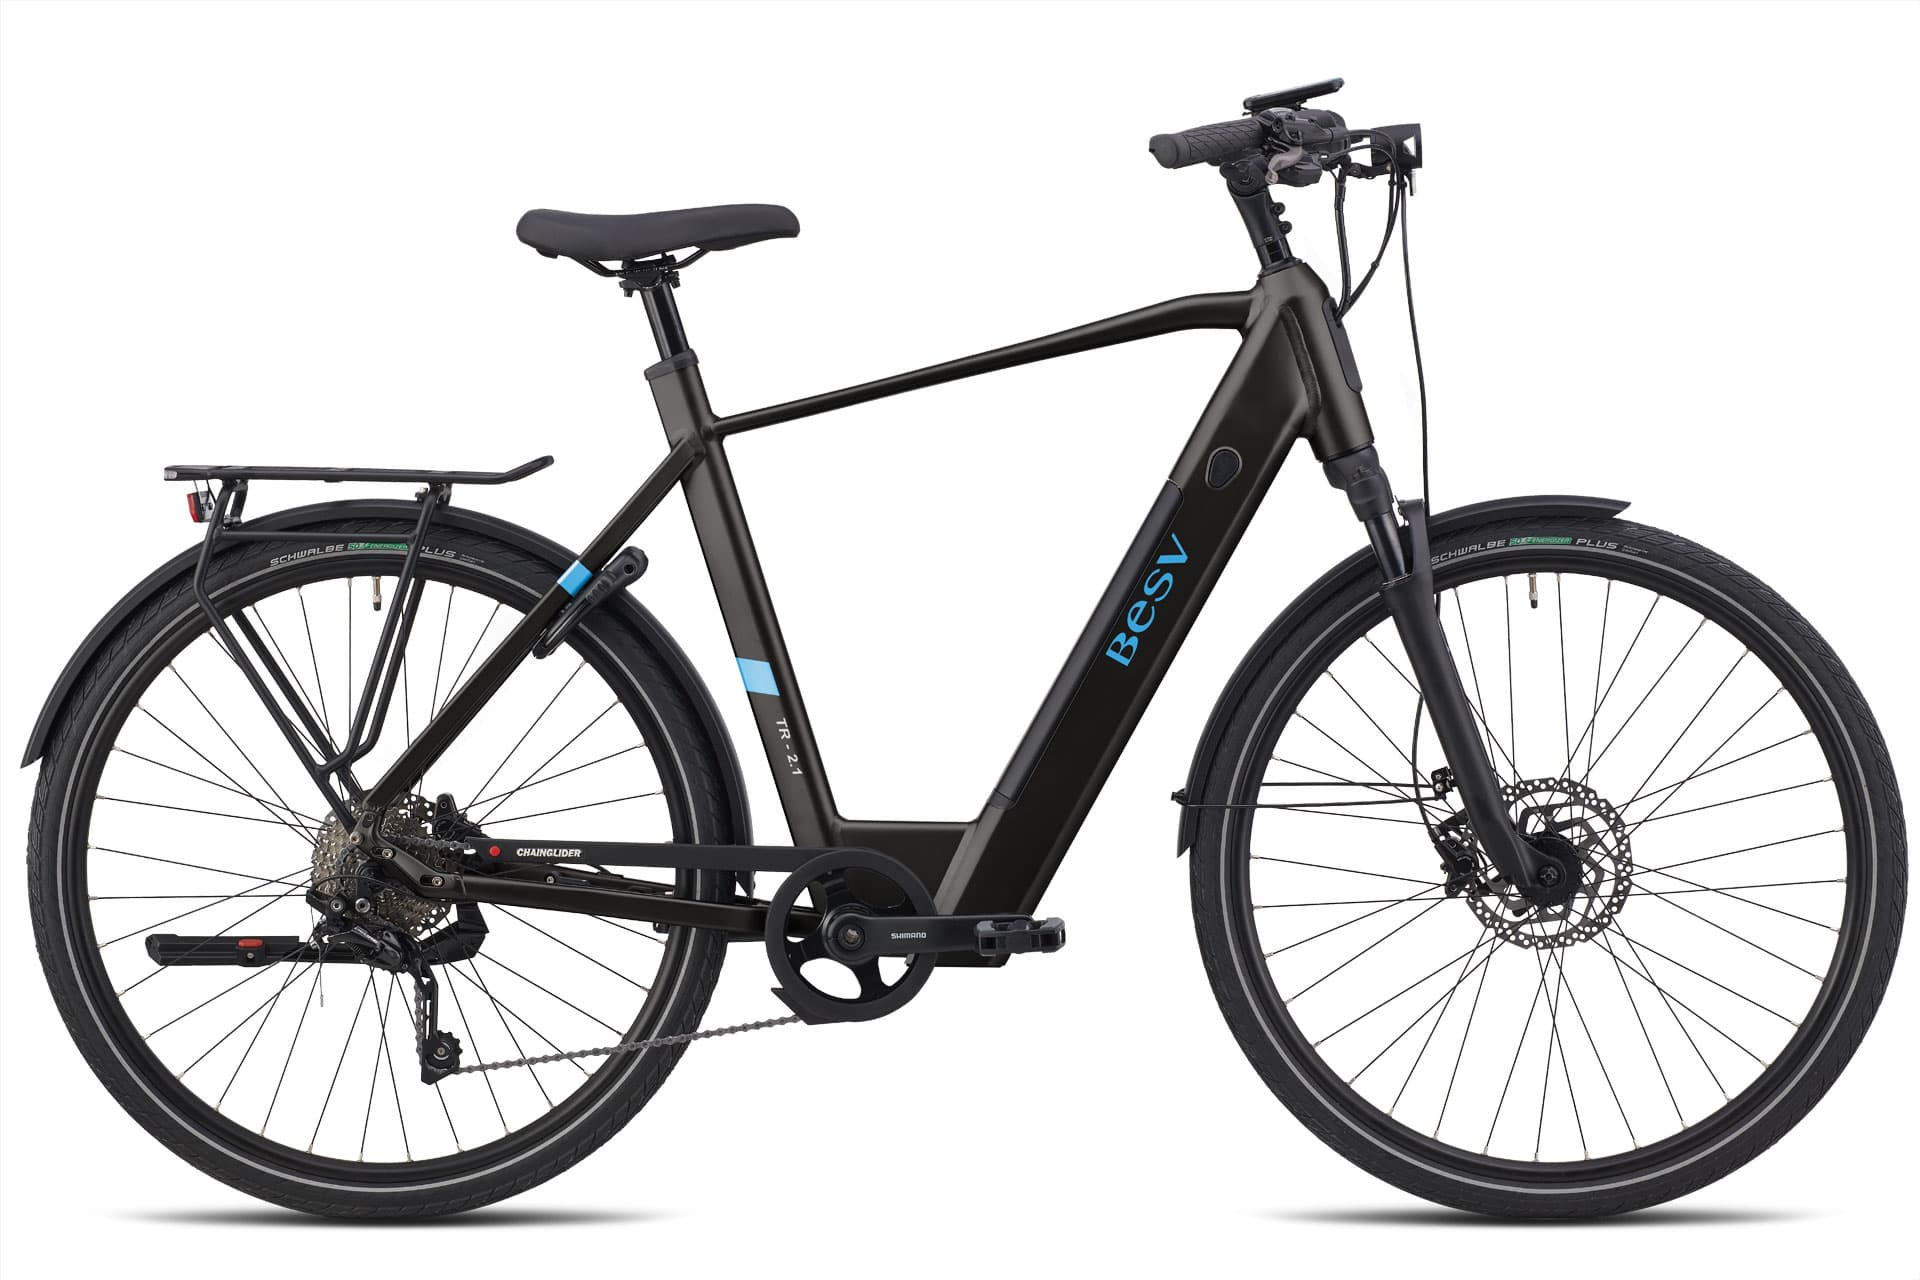 Electric Trekking Bike BESV TR 2.1 black XL 60cm